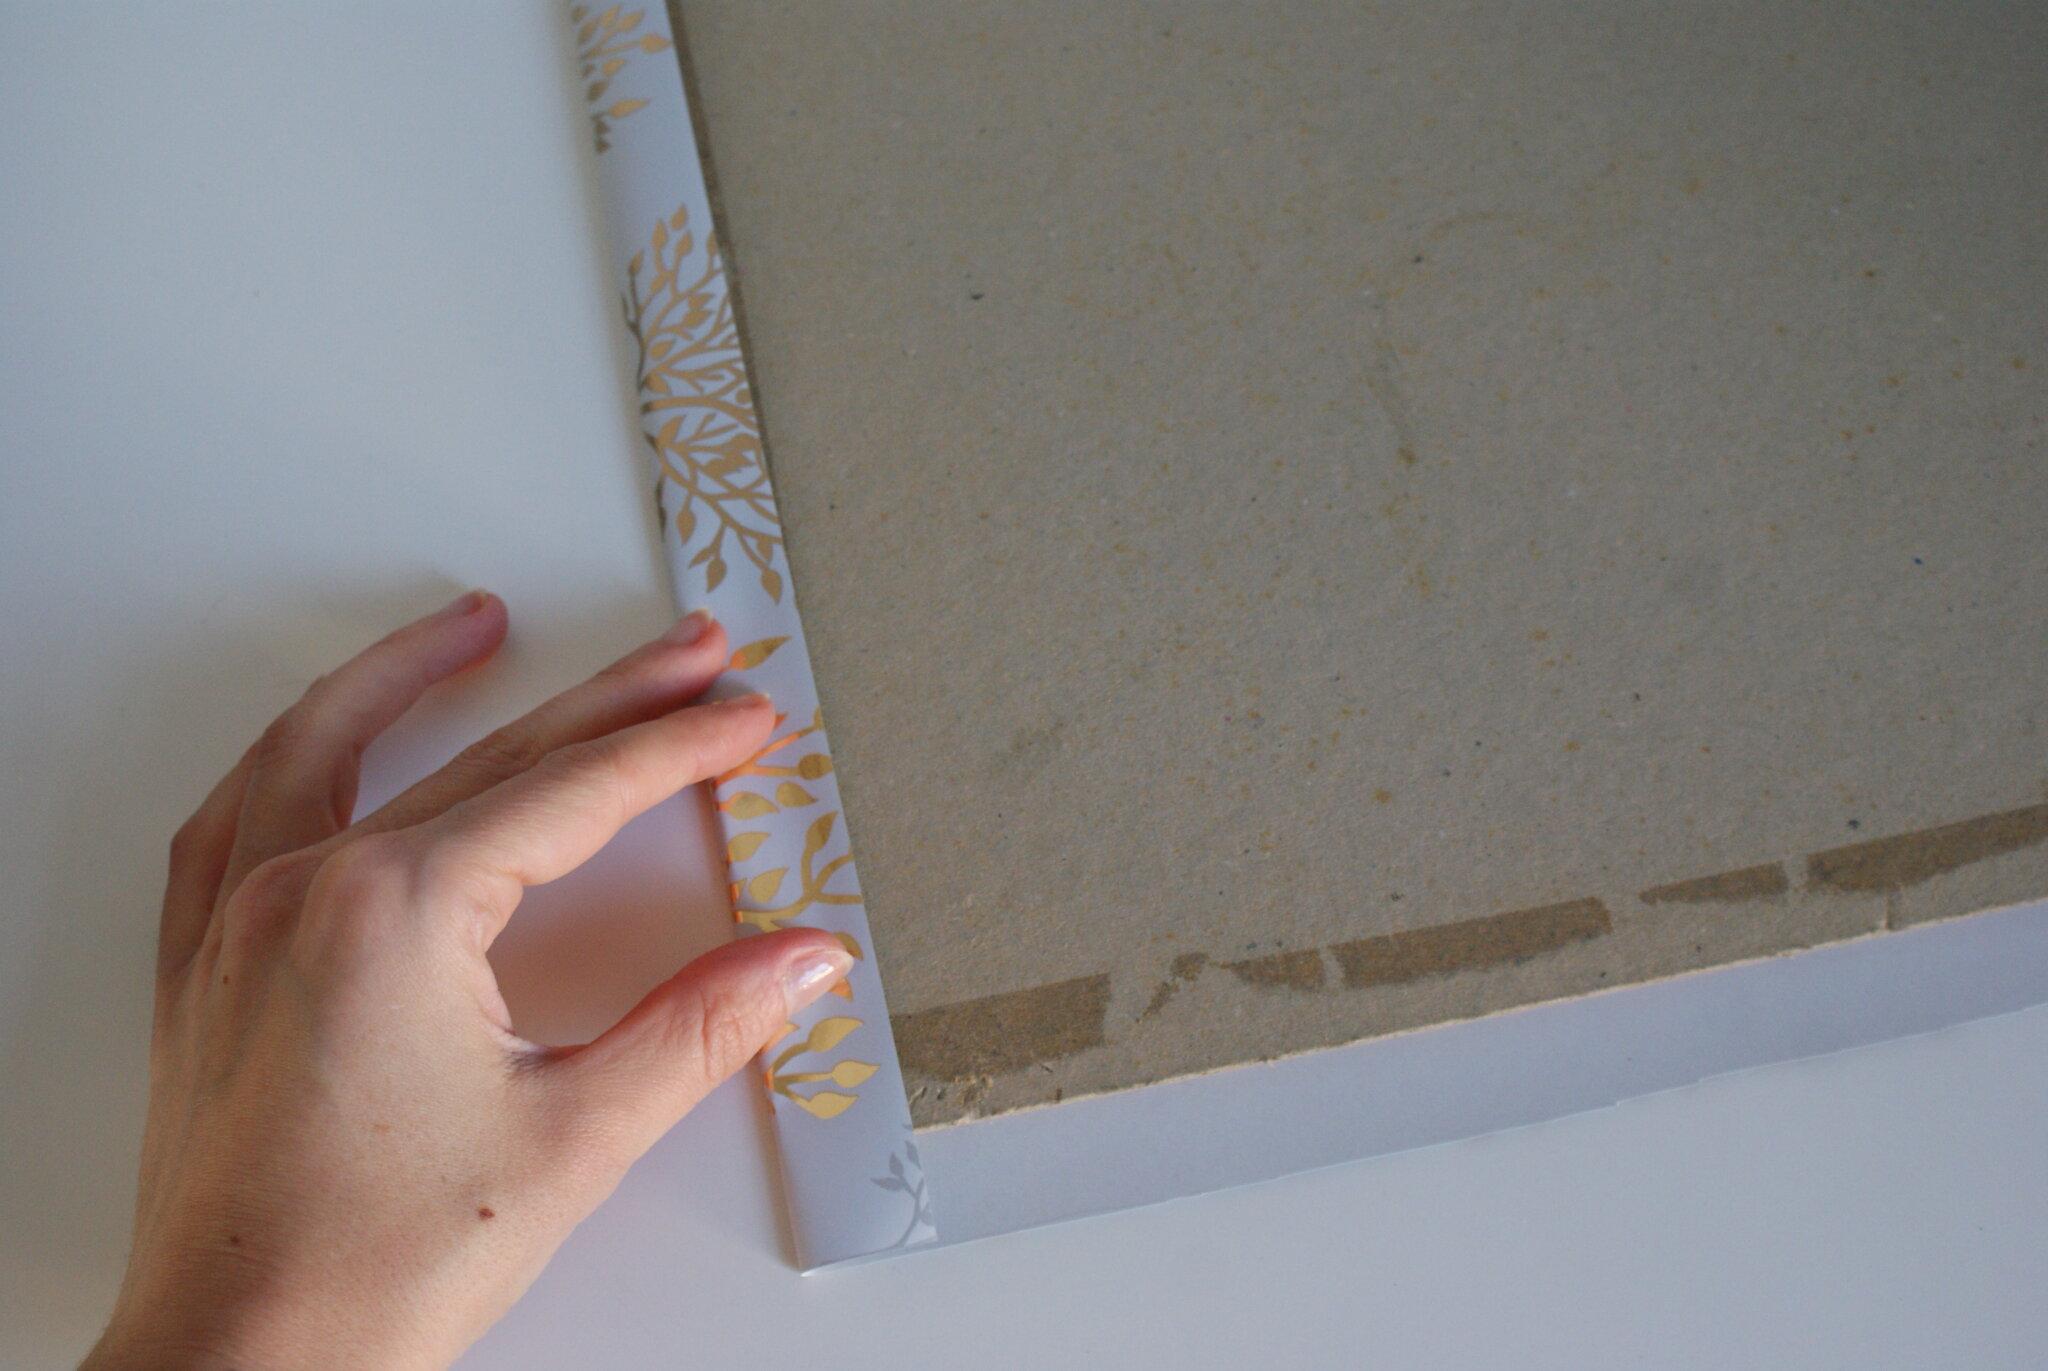 tutorial fai da te lavagna lavagnetta cancellabile facile veloce francinesplaceblog